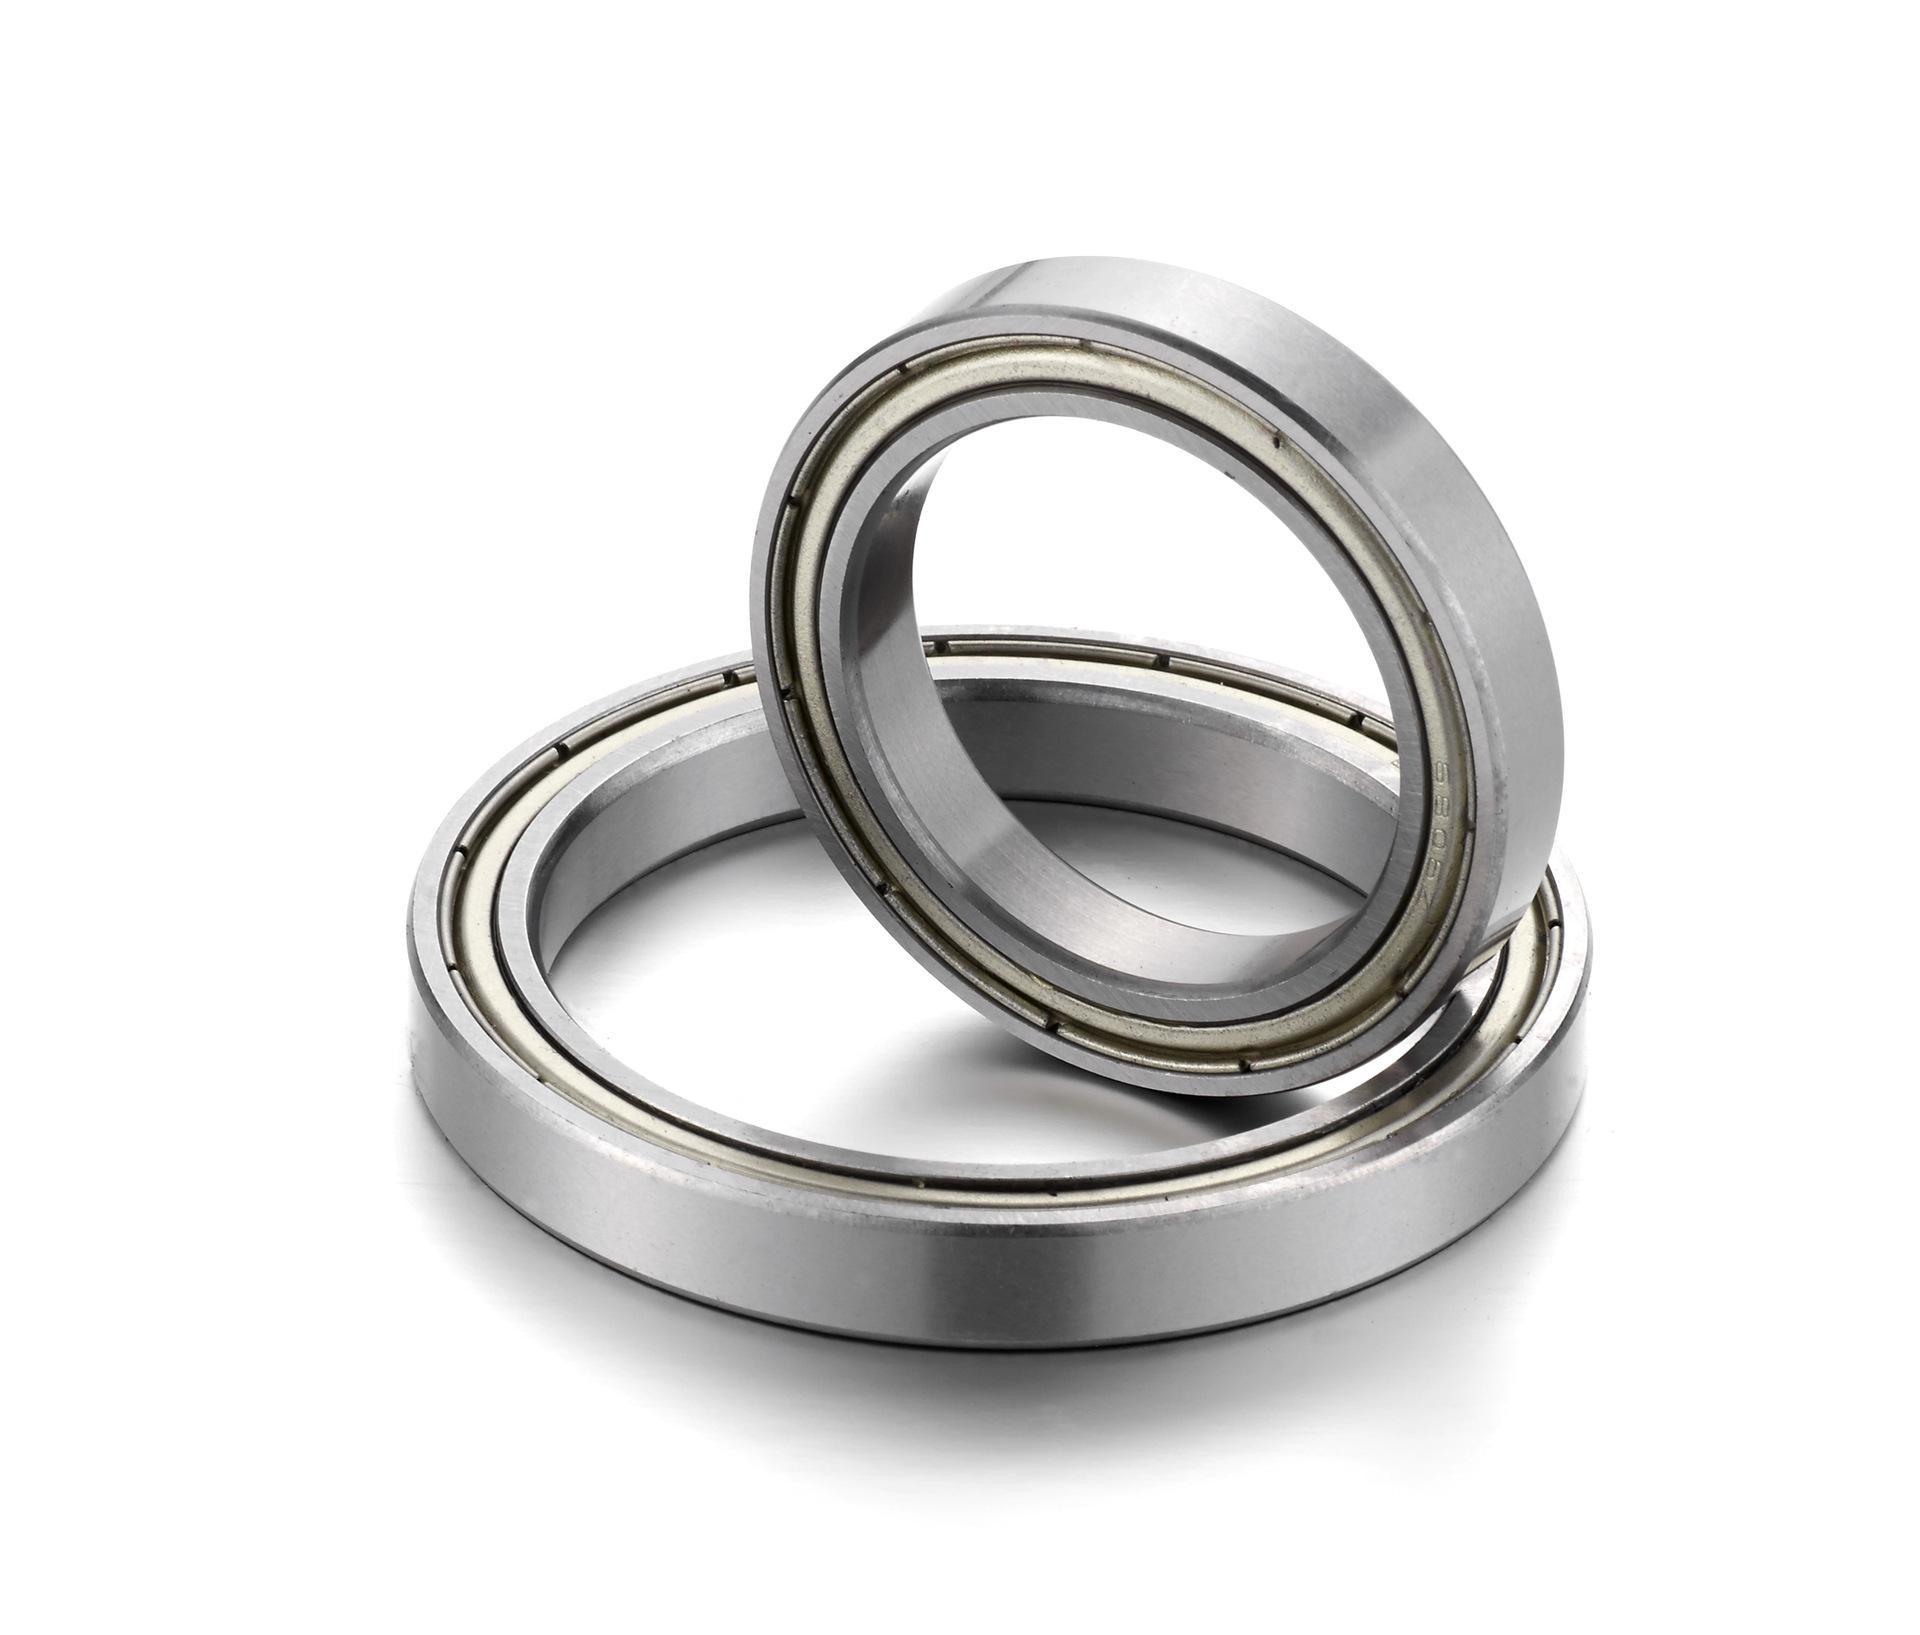 6924M  ABEC-1 120x165x22MM  Metric Thin Section Bearings 61924M Brass cage 1pcs 71901 71901cd p4 7901 12x24x6 mochu thin walled miniature angular contact bearings speed spindle bearings cnc abec 7